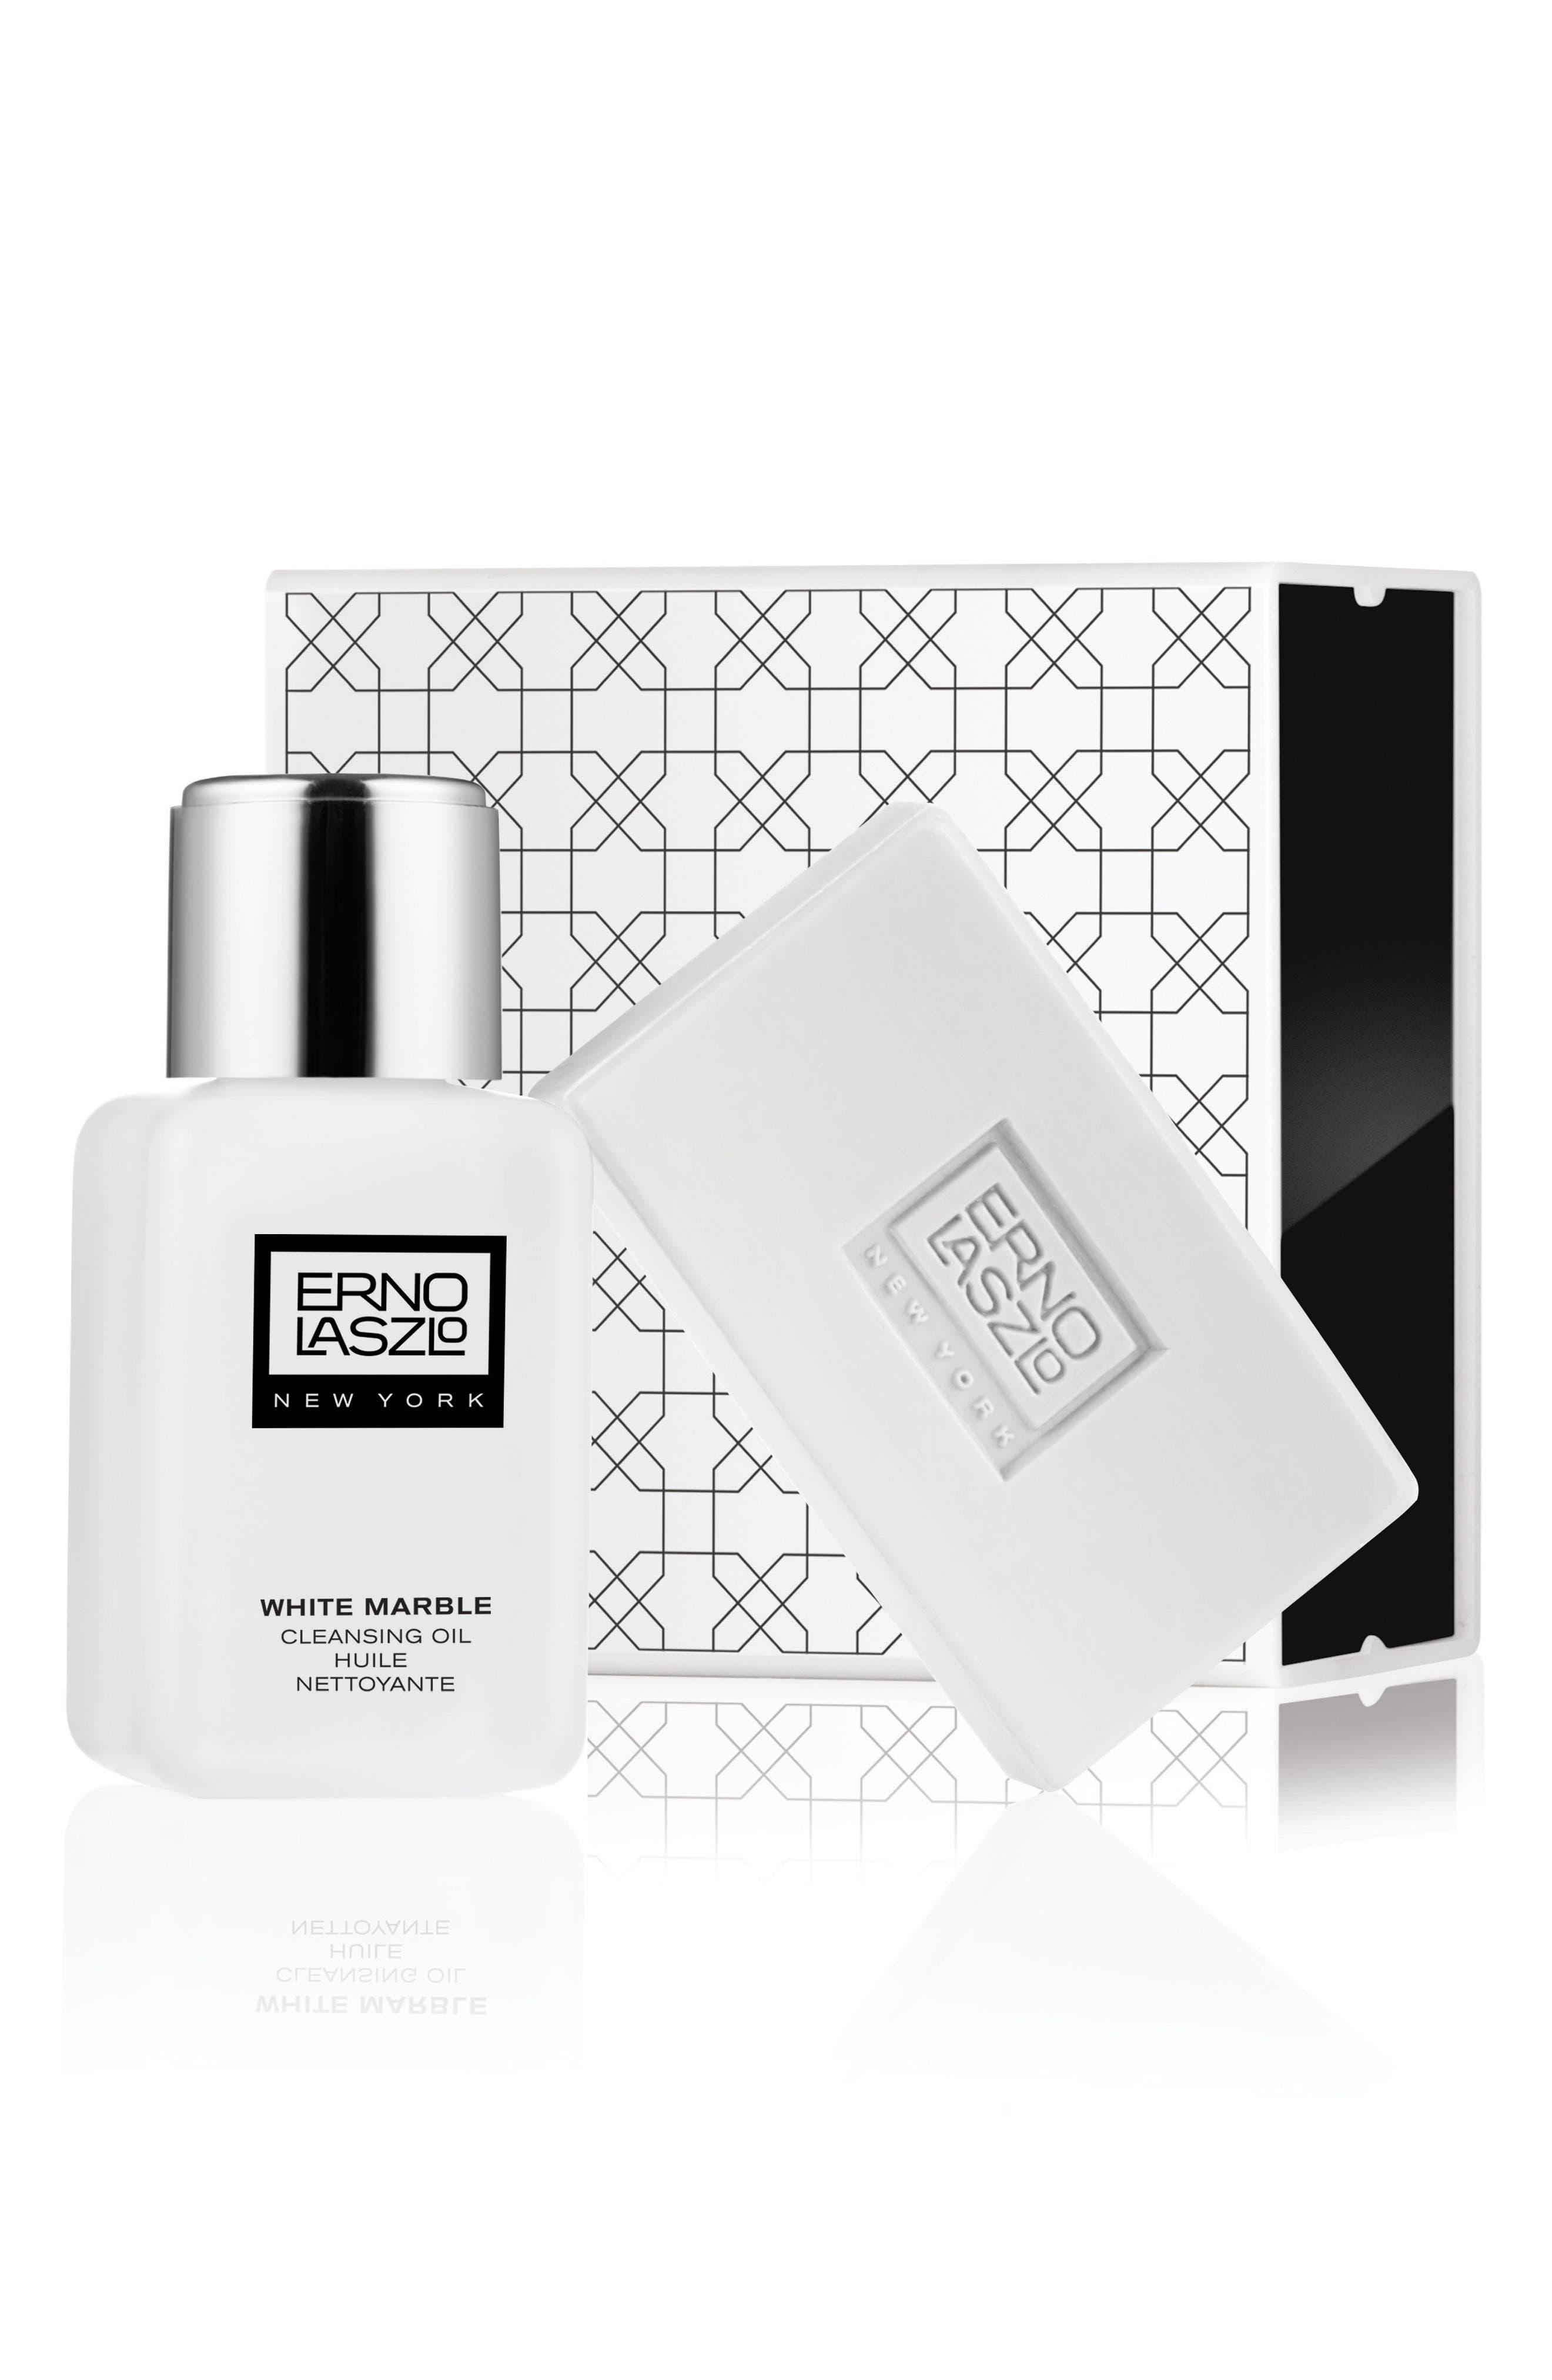 Erno Laszlo White Marble Double Cleanse Travel Set ($38 Value)